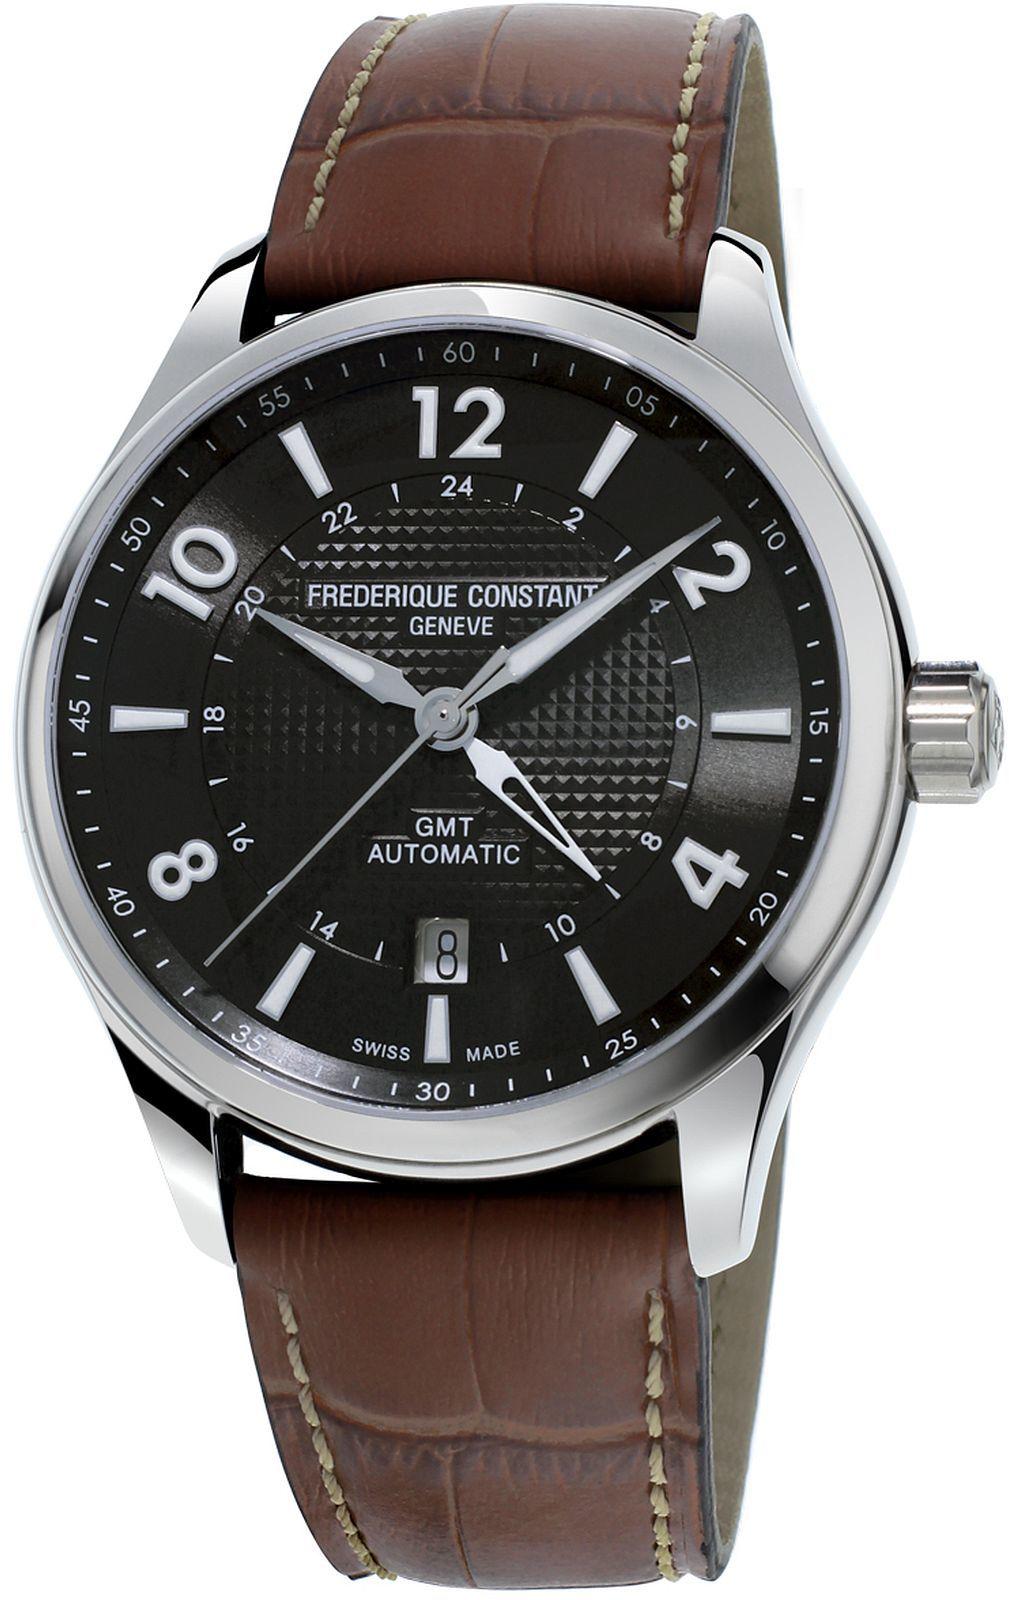 Zegarek męski Frederique Constant Runabout GMT Automatic Limited Edition